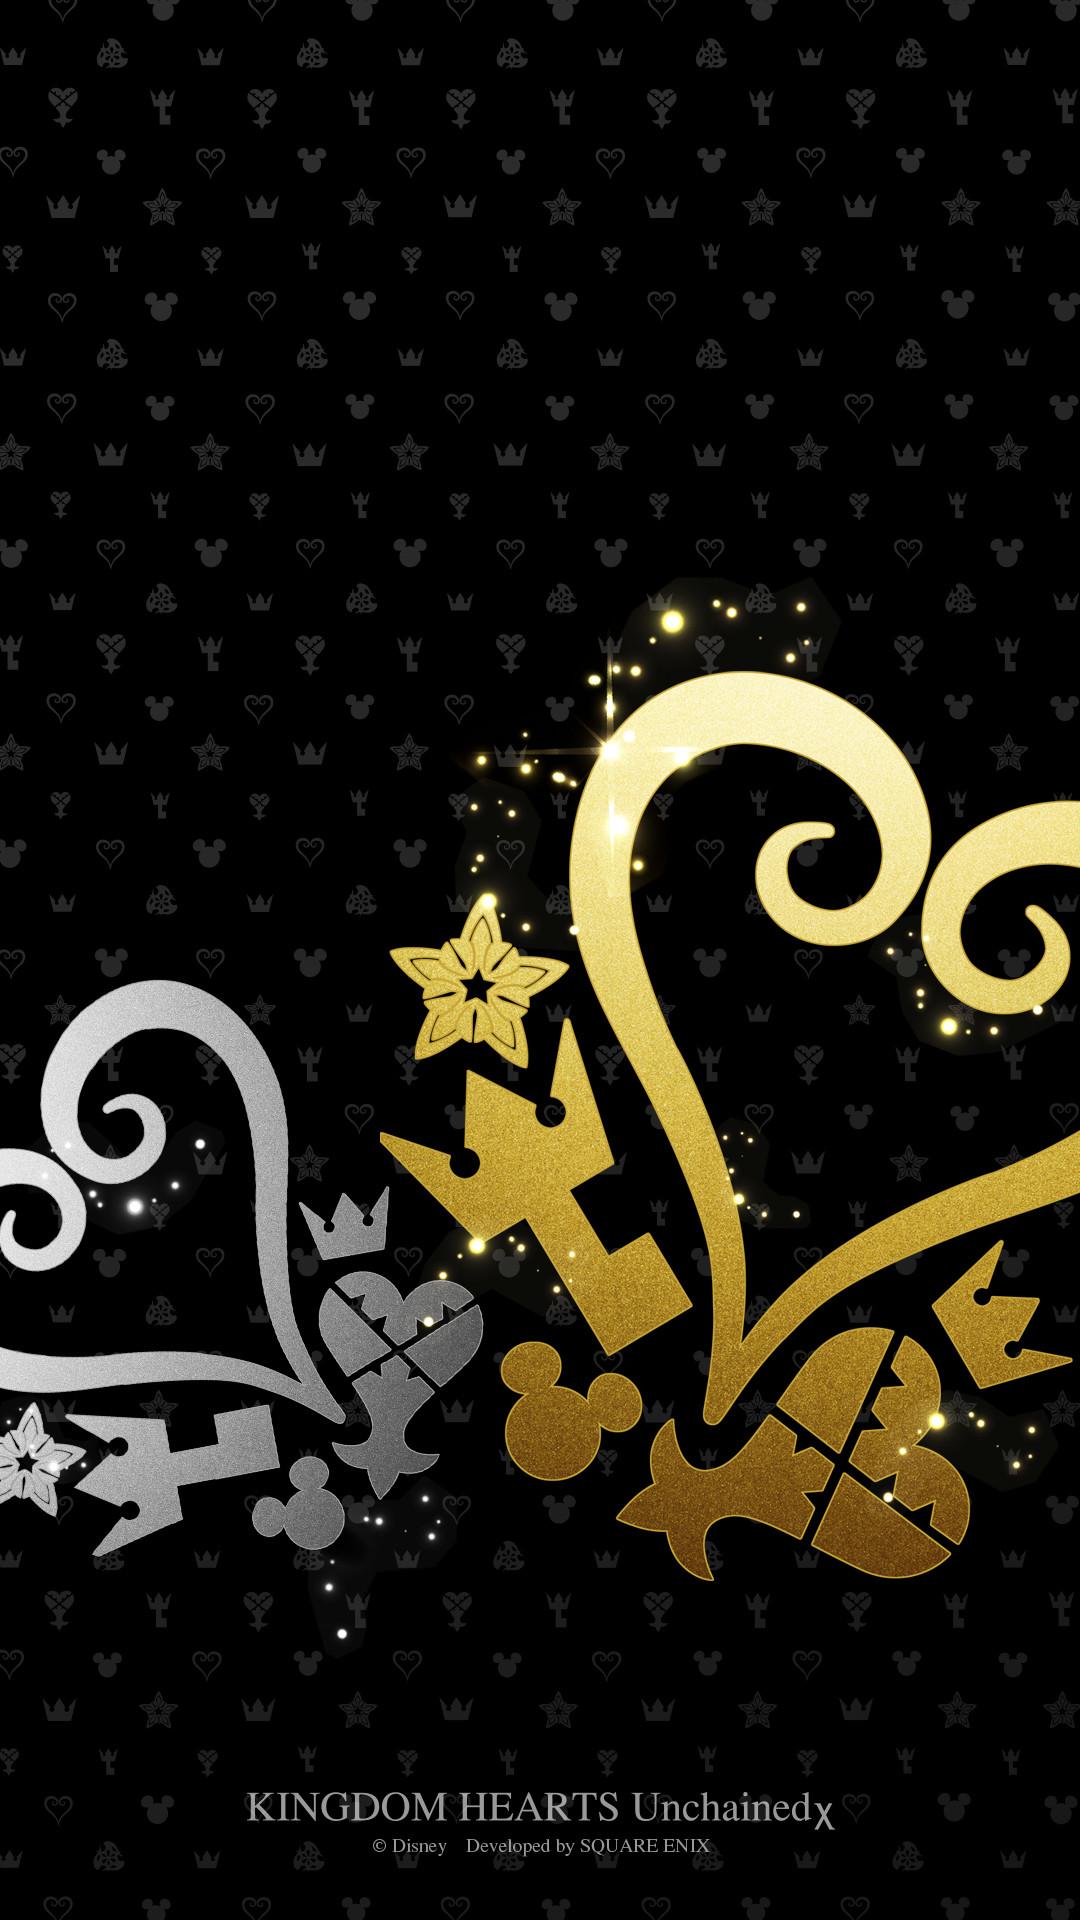 Beautiful Love Heart Wallpapers TechLovers l Web Design